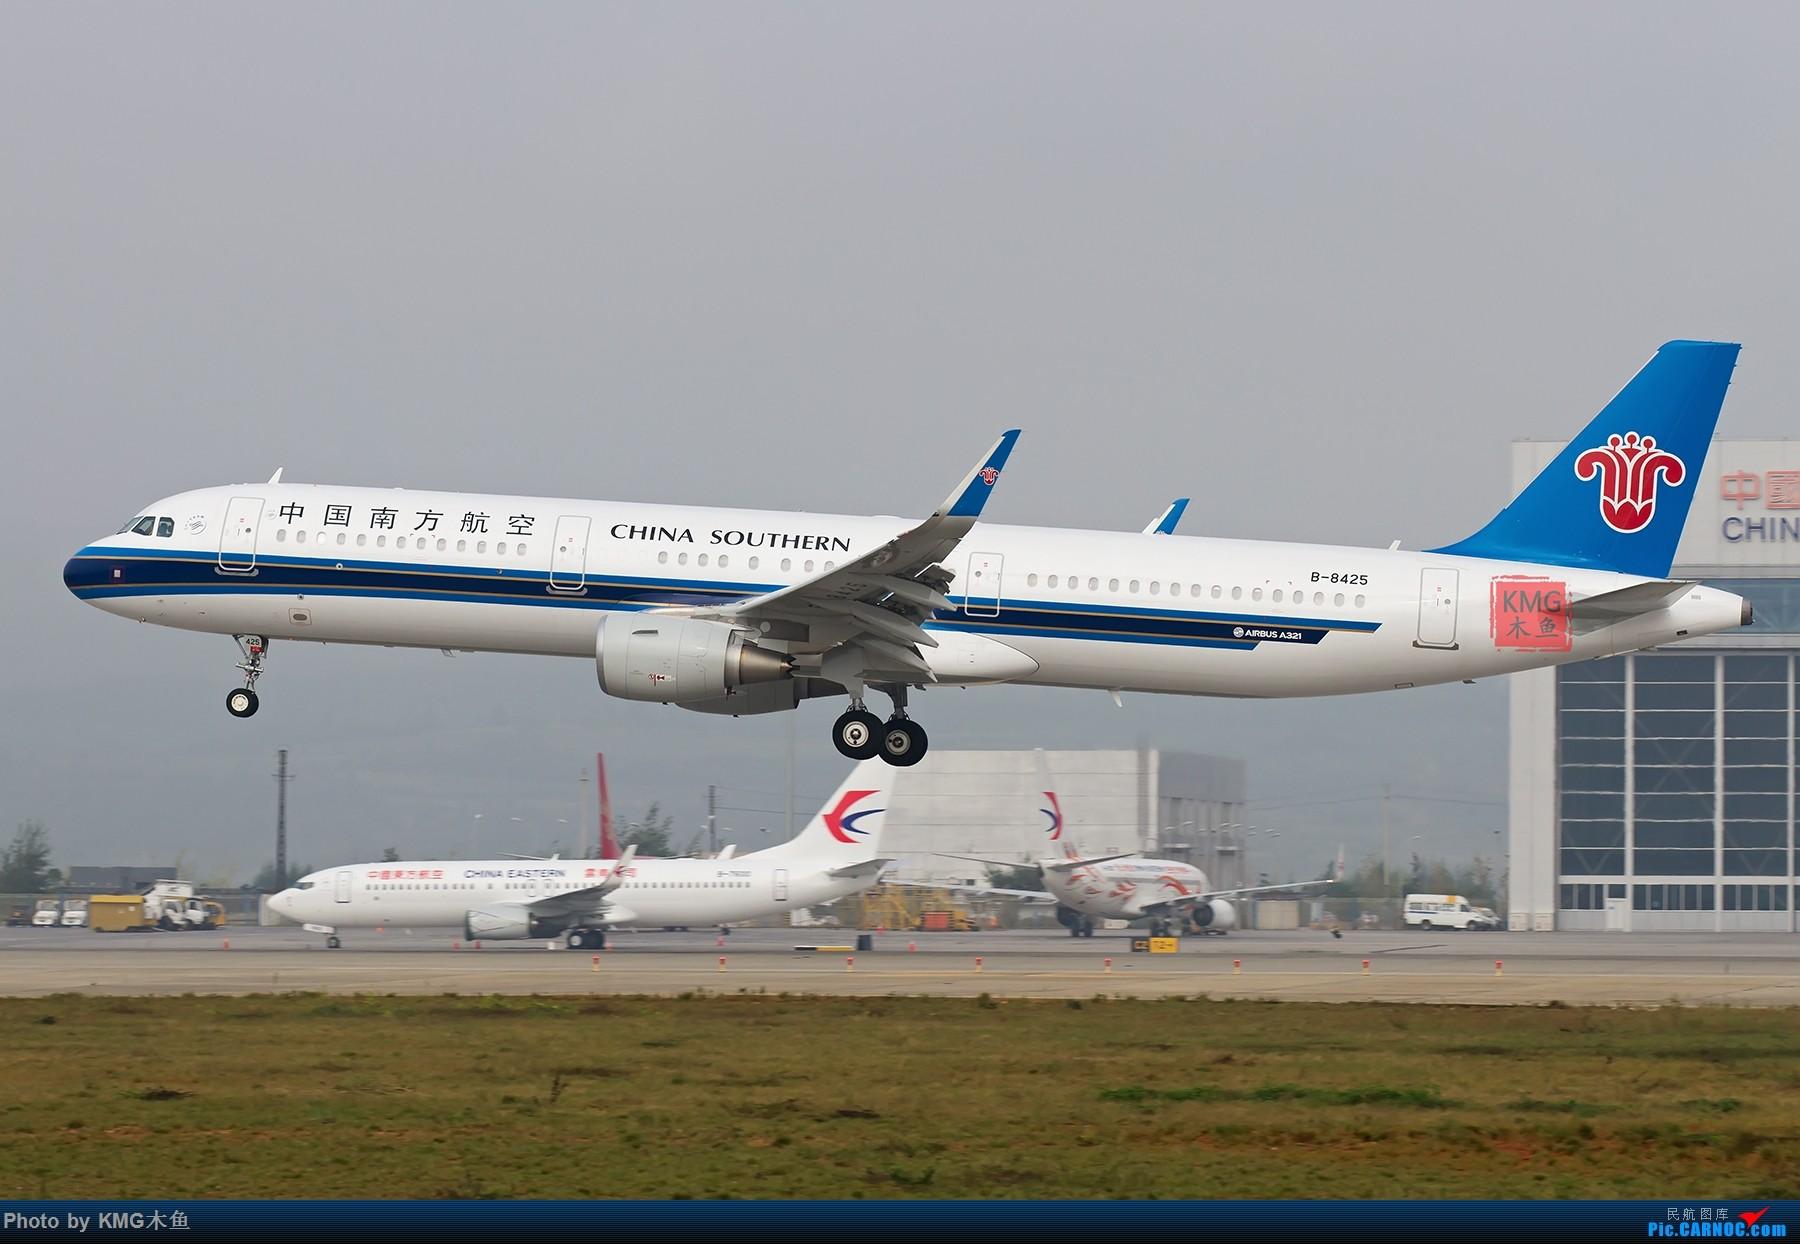 Re:[原创]【昆明长水国际机场—KMG木鱼10.16日拍机】周末拍机,有宽体,有彩绘,少了小伙伴们,独自一人拍机 AIRBUS A321-200 B-8425 中国昆明长水国际机场